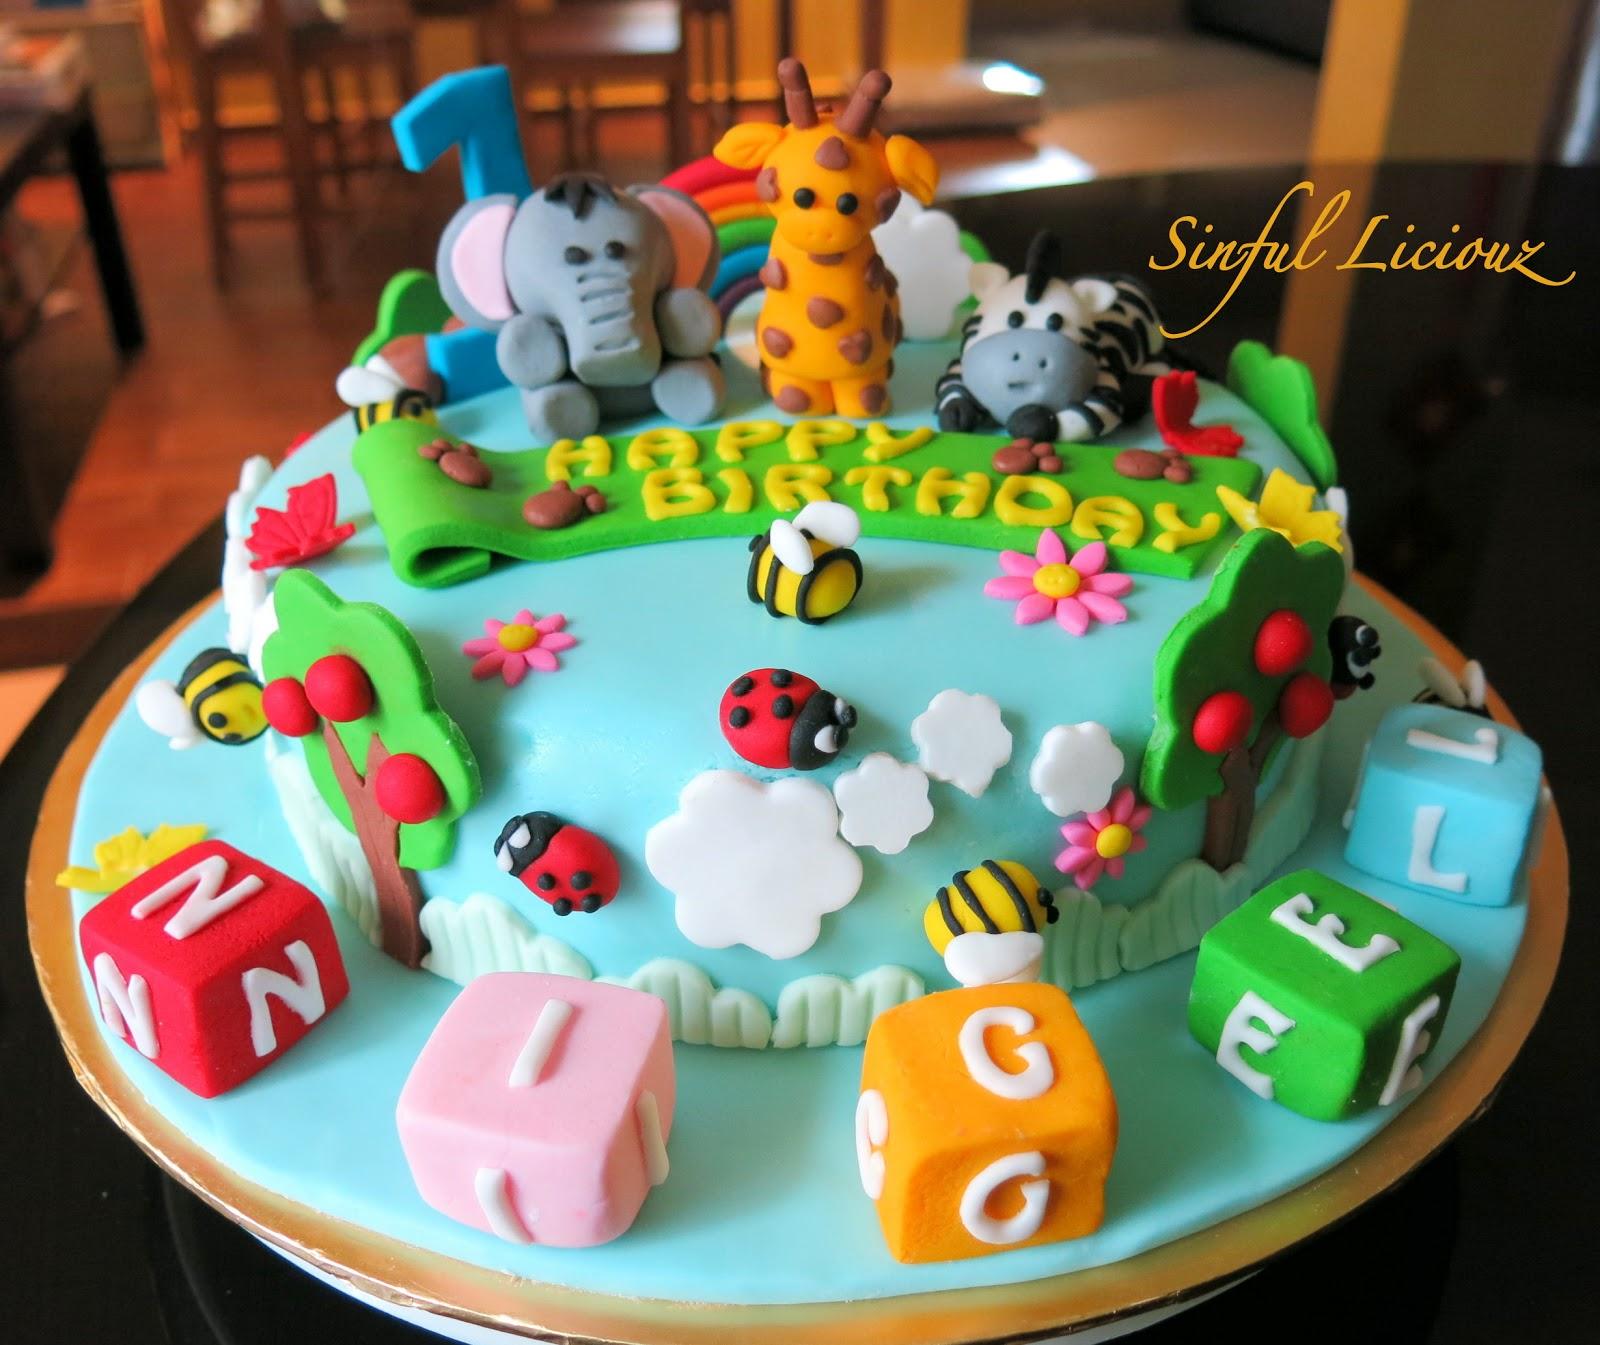 Sinful Liciouz Animal Theme Design Cake